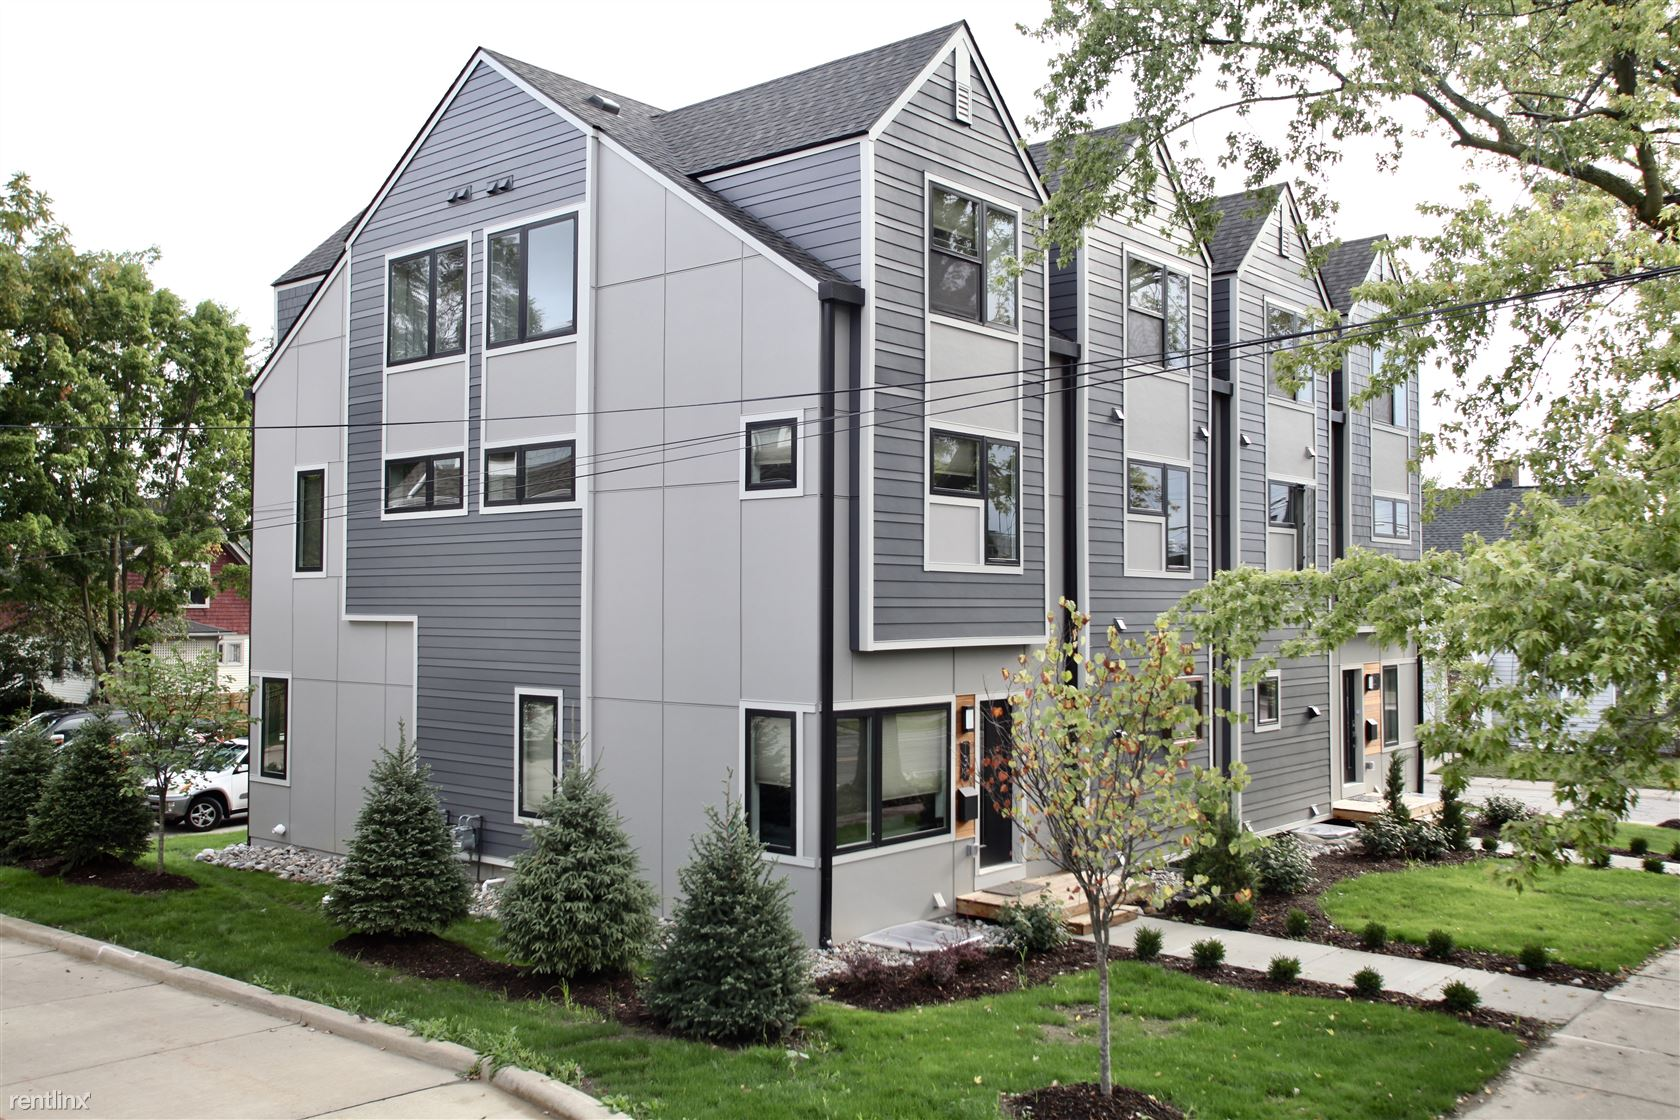 145 Hill St, Ann Arbor, MI - $5,700